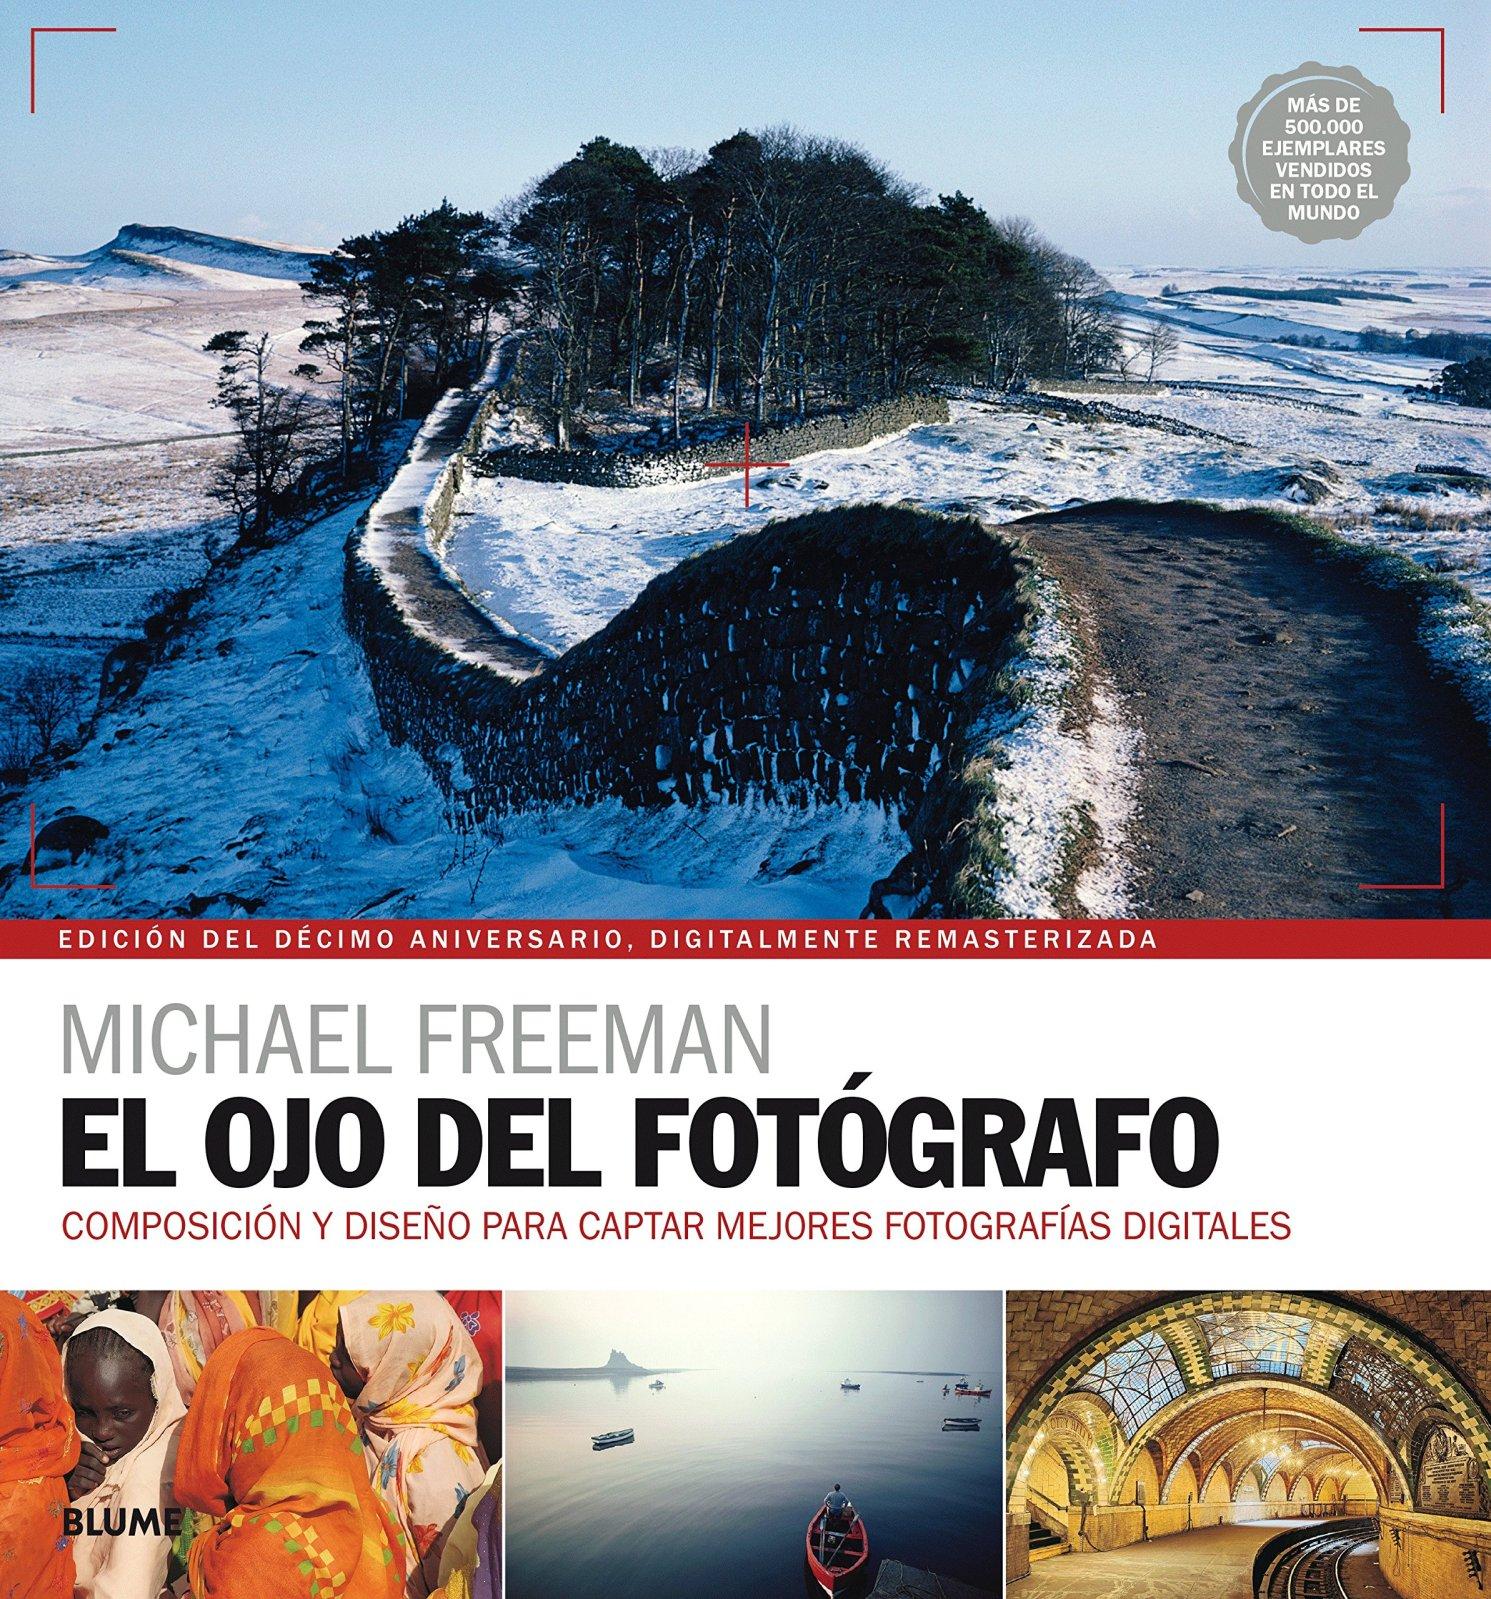 El ojo del fotografo, Martin Freeman